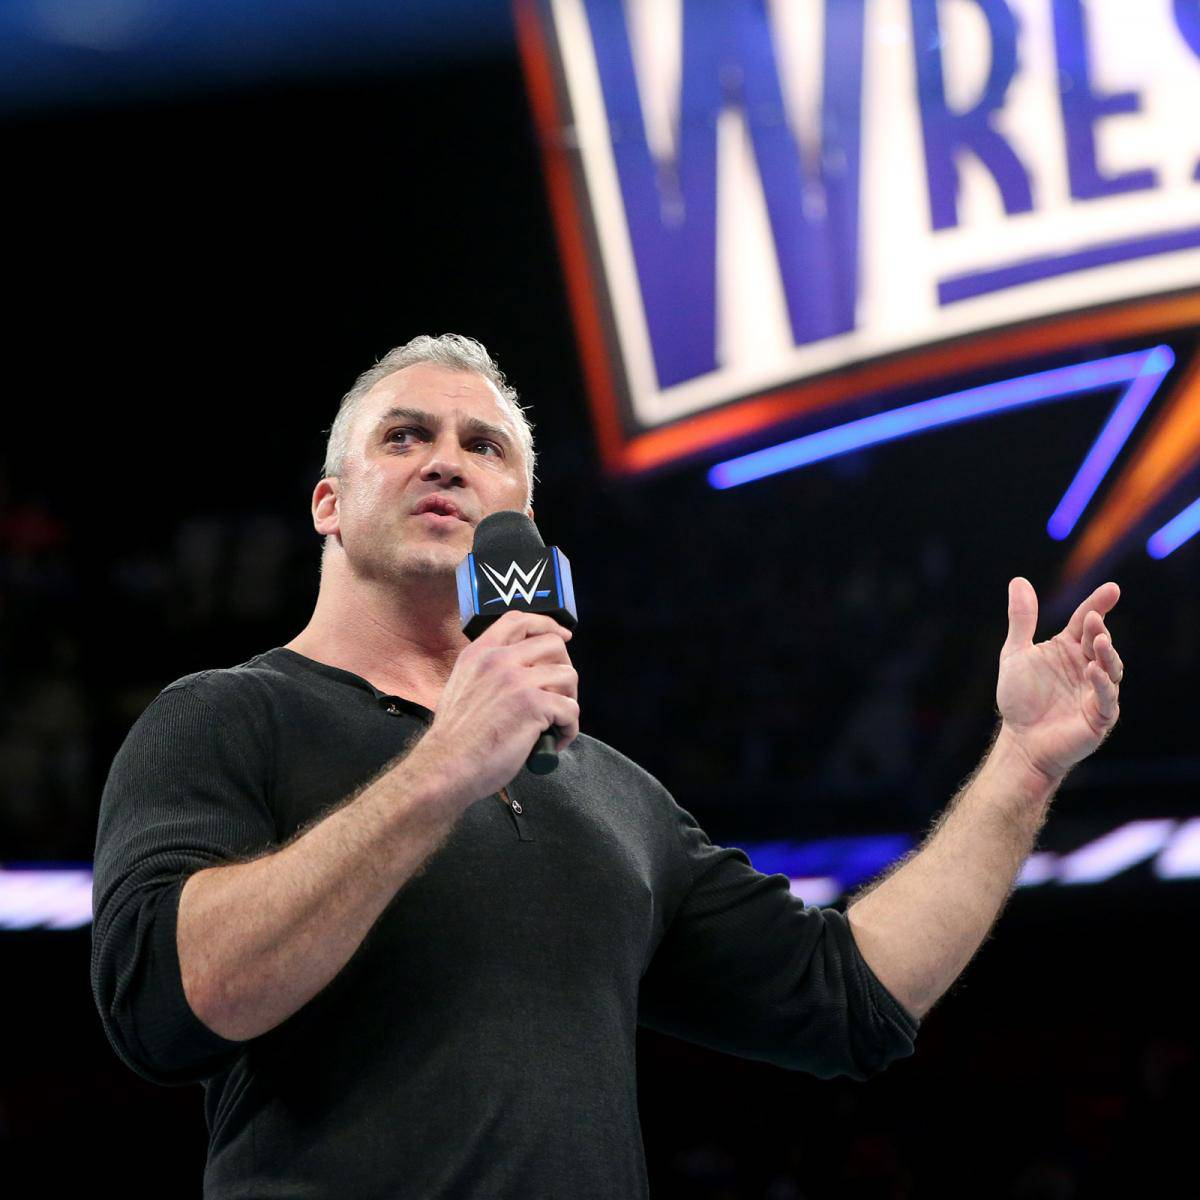 WWE-Smackdown-Live-3-21-17-Shane-McMahon-AJ-Styles-03